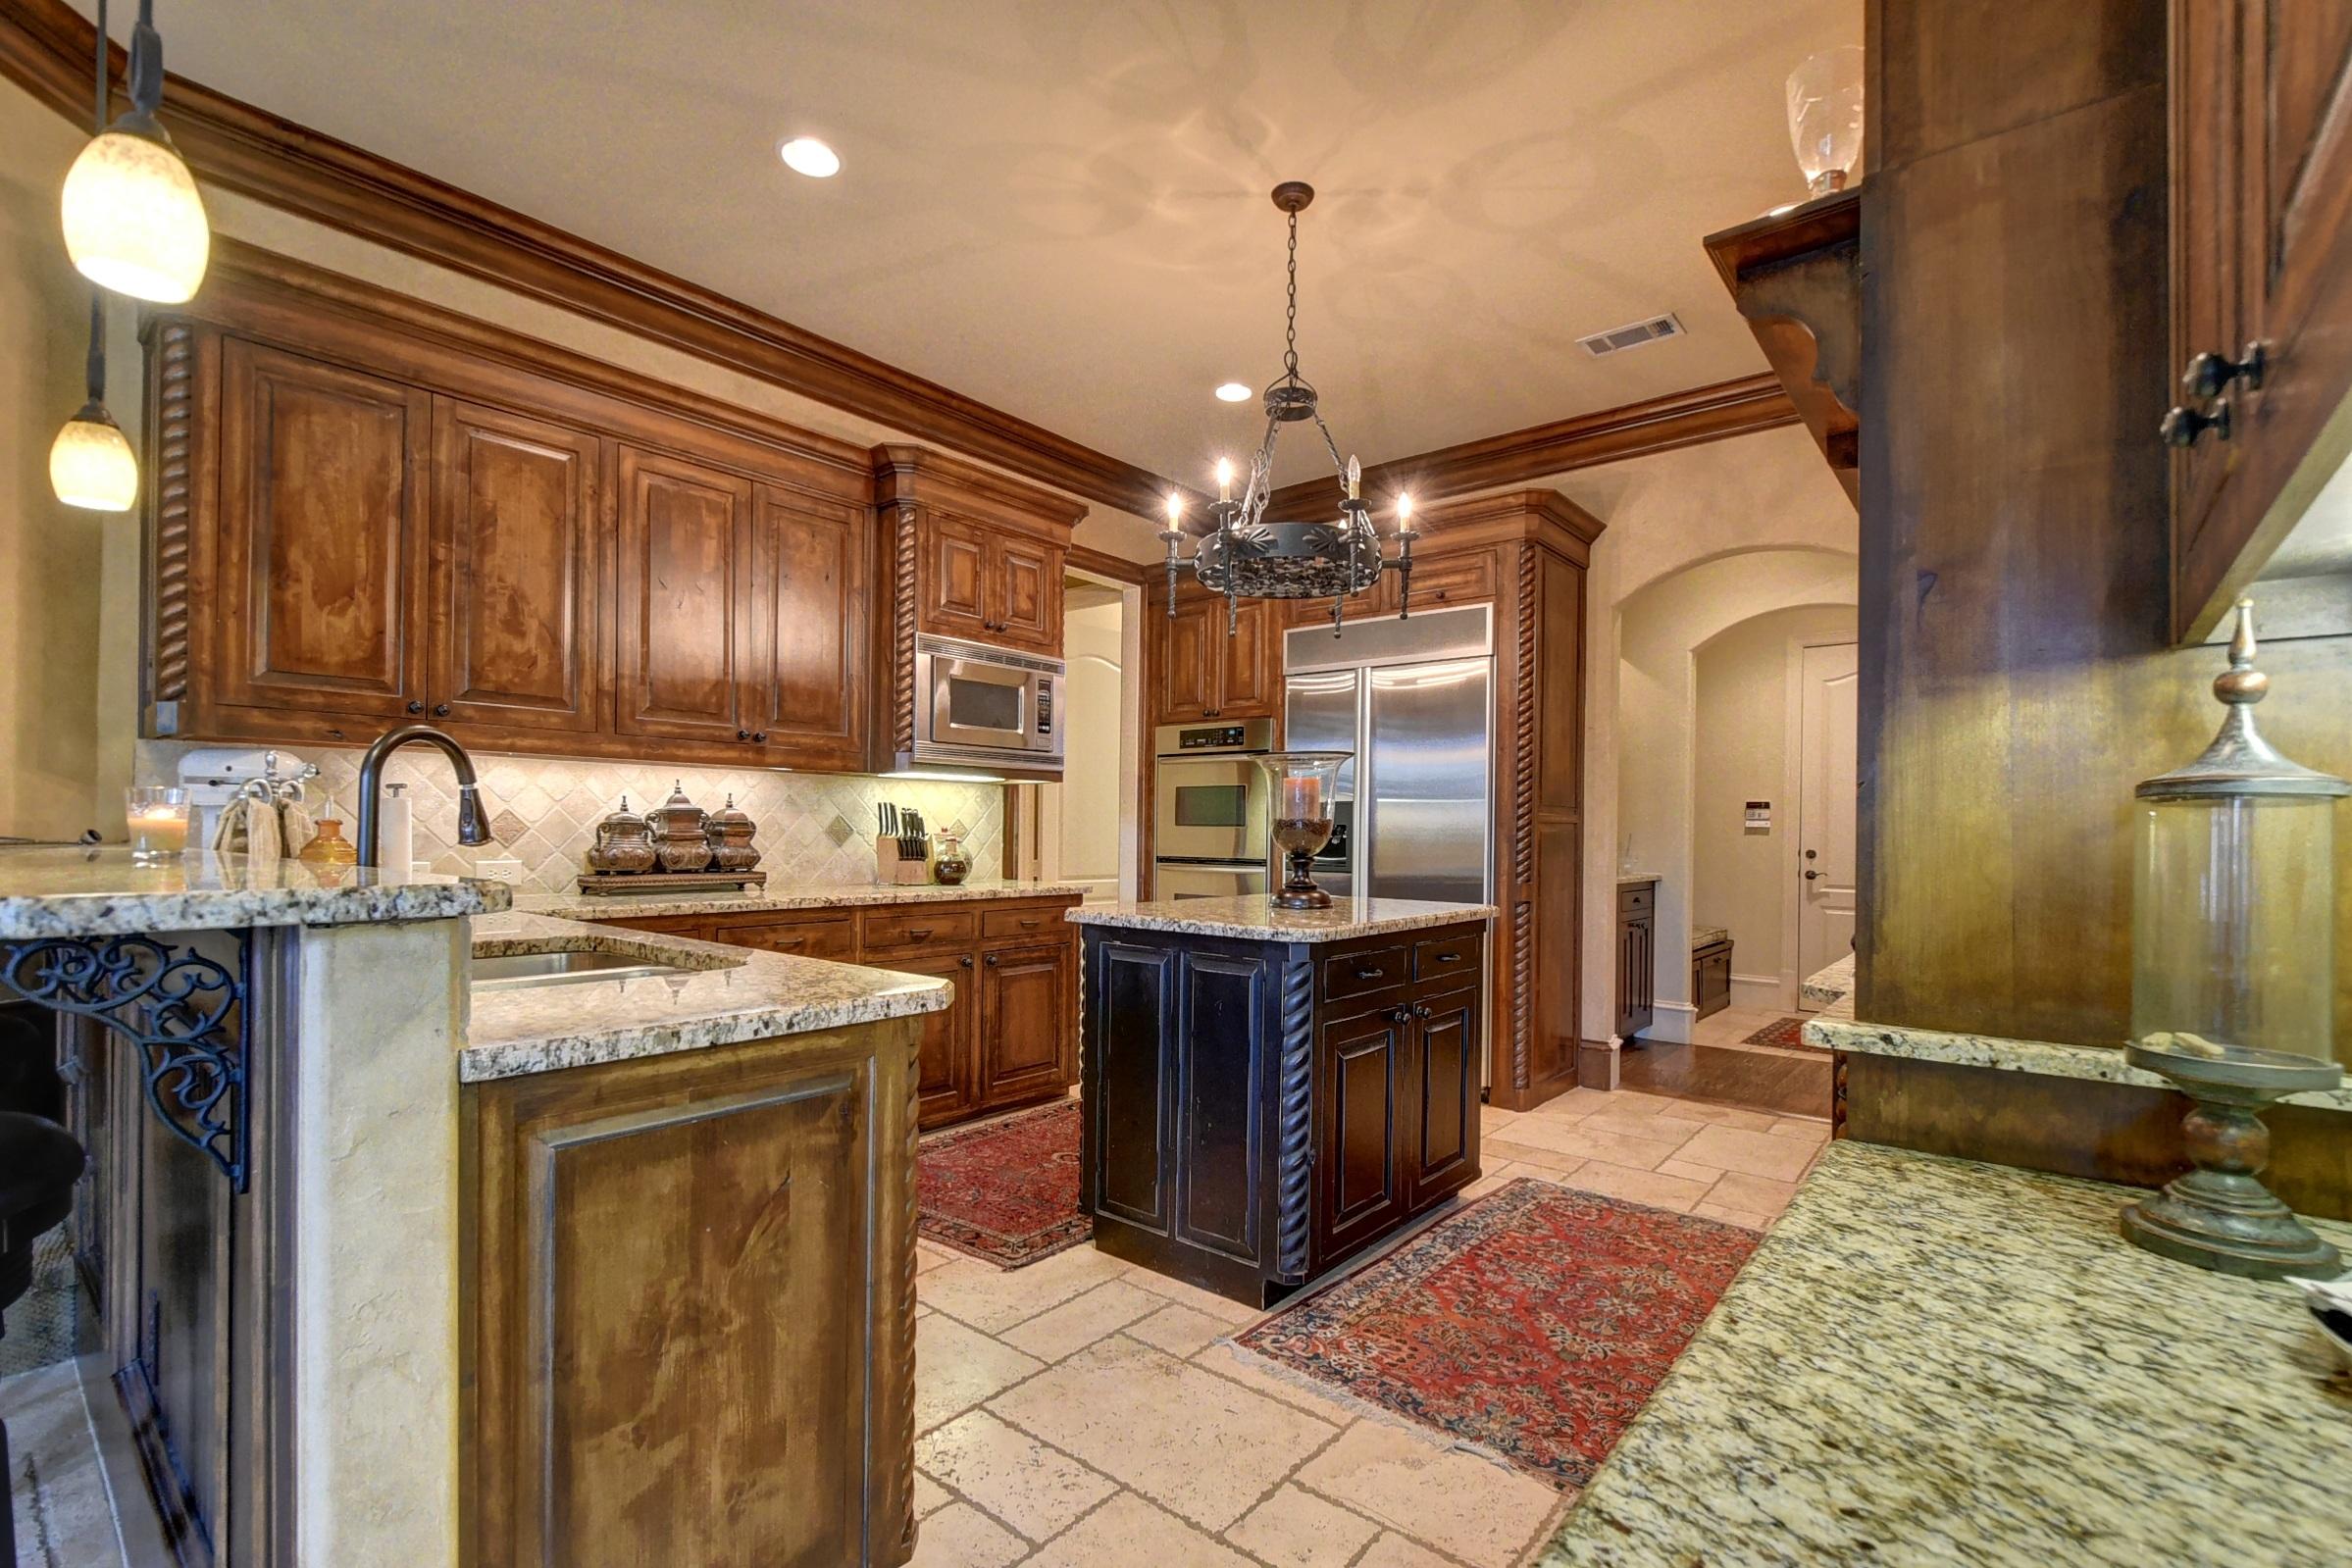 Architecture Mansion House Floor Home Counter Cottage Kitchen Property Room Countertop Interior Design Luxury Farmhouse Elegant